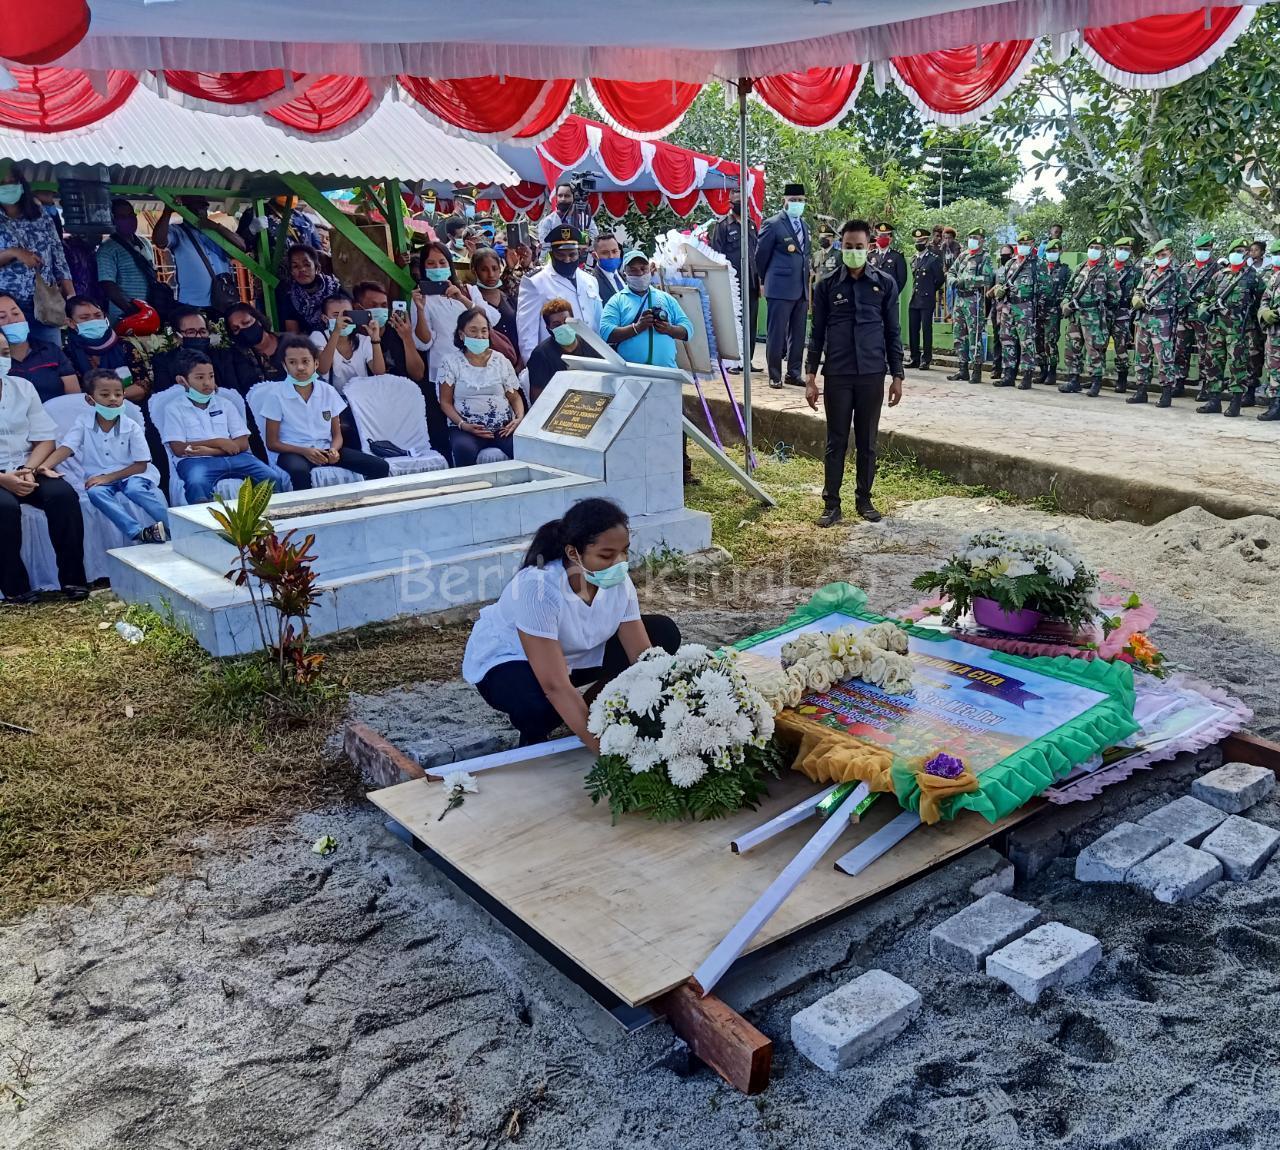 Gubernur PB, Pimpin Pemakaman Alm. Bupati Manokwari Demas Paulus Mandacan 3 IMG 20200423 WA0038